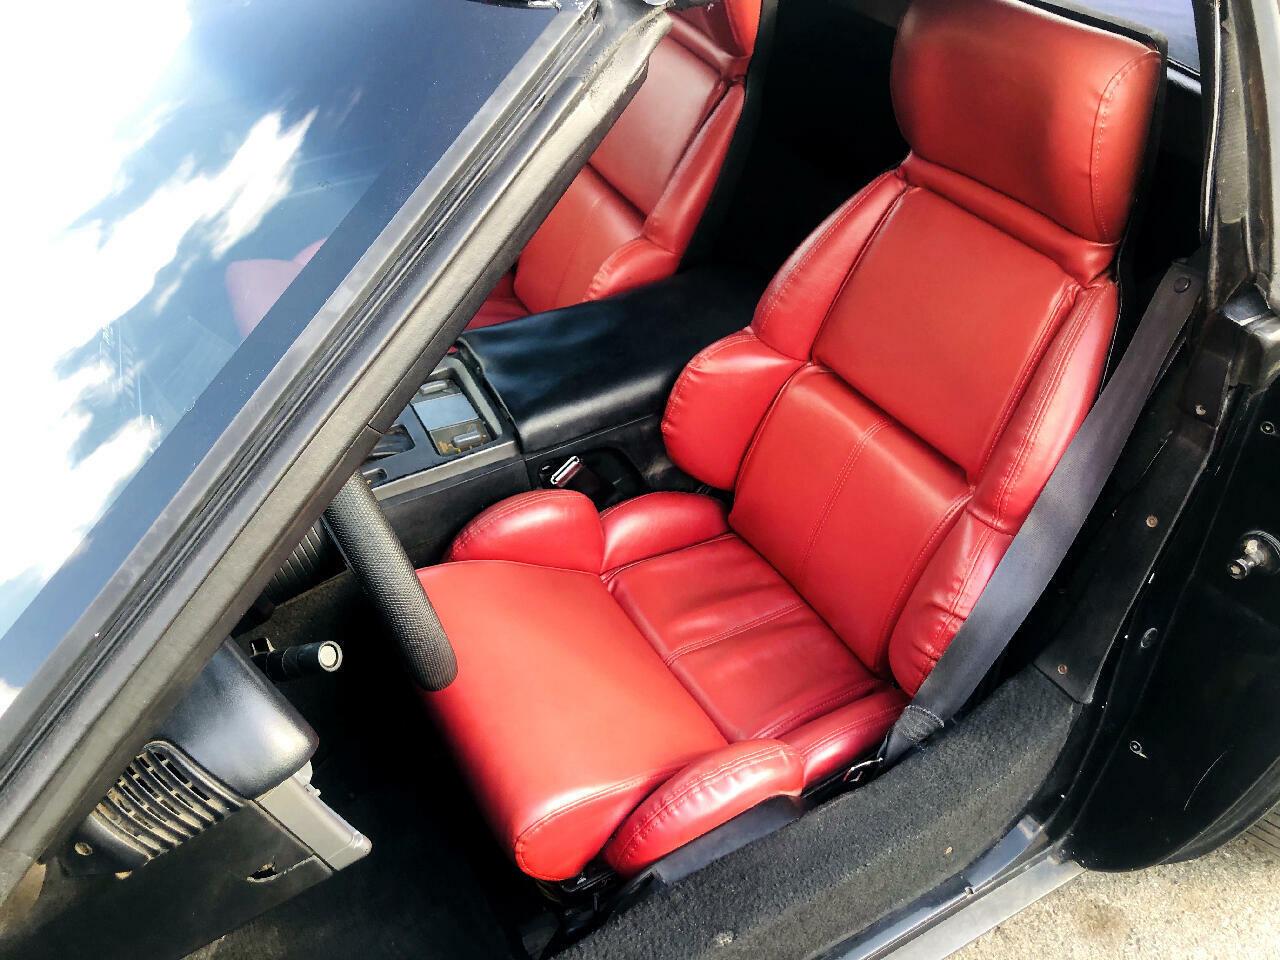 1991 Black Chevrolet Corvette Convertible  | C4 Corvette Photo 10